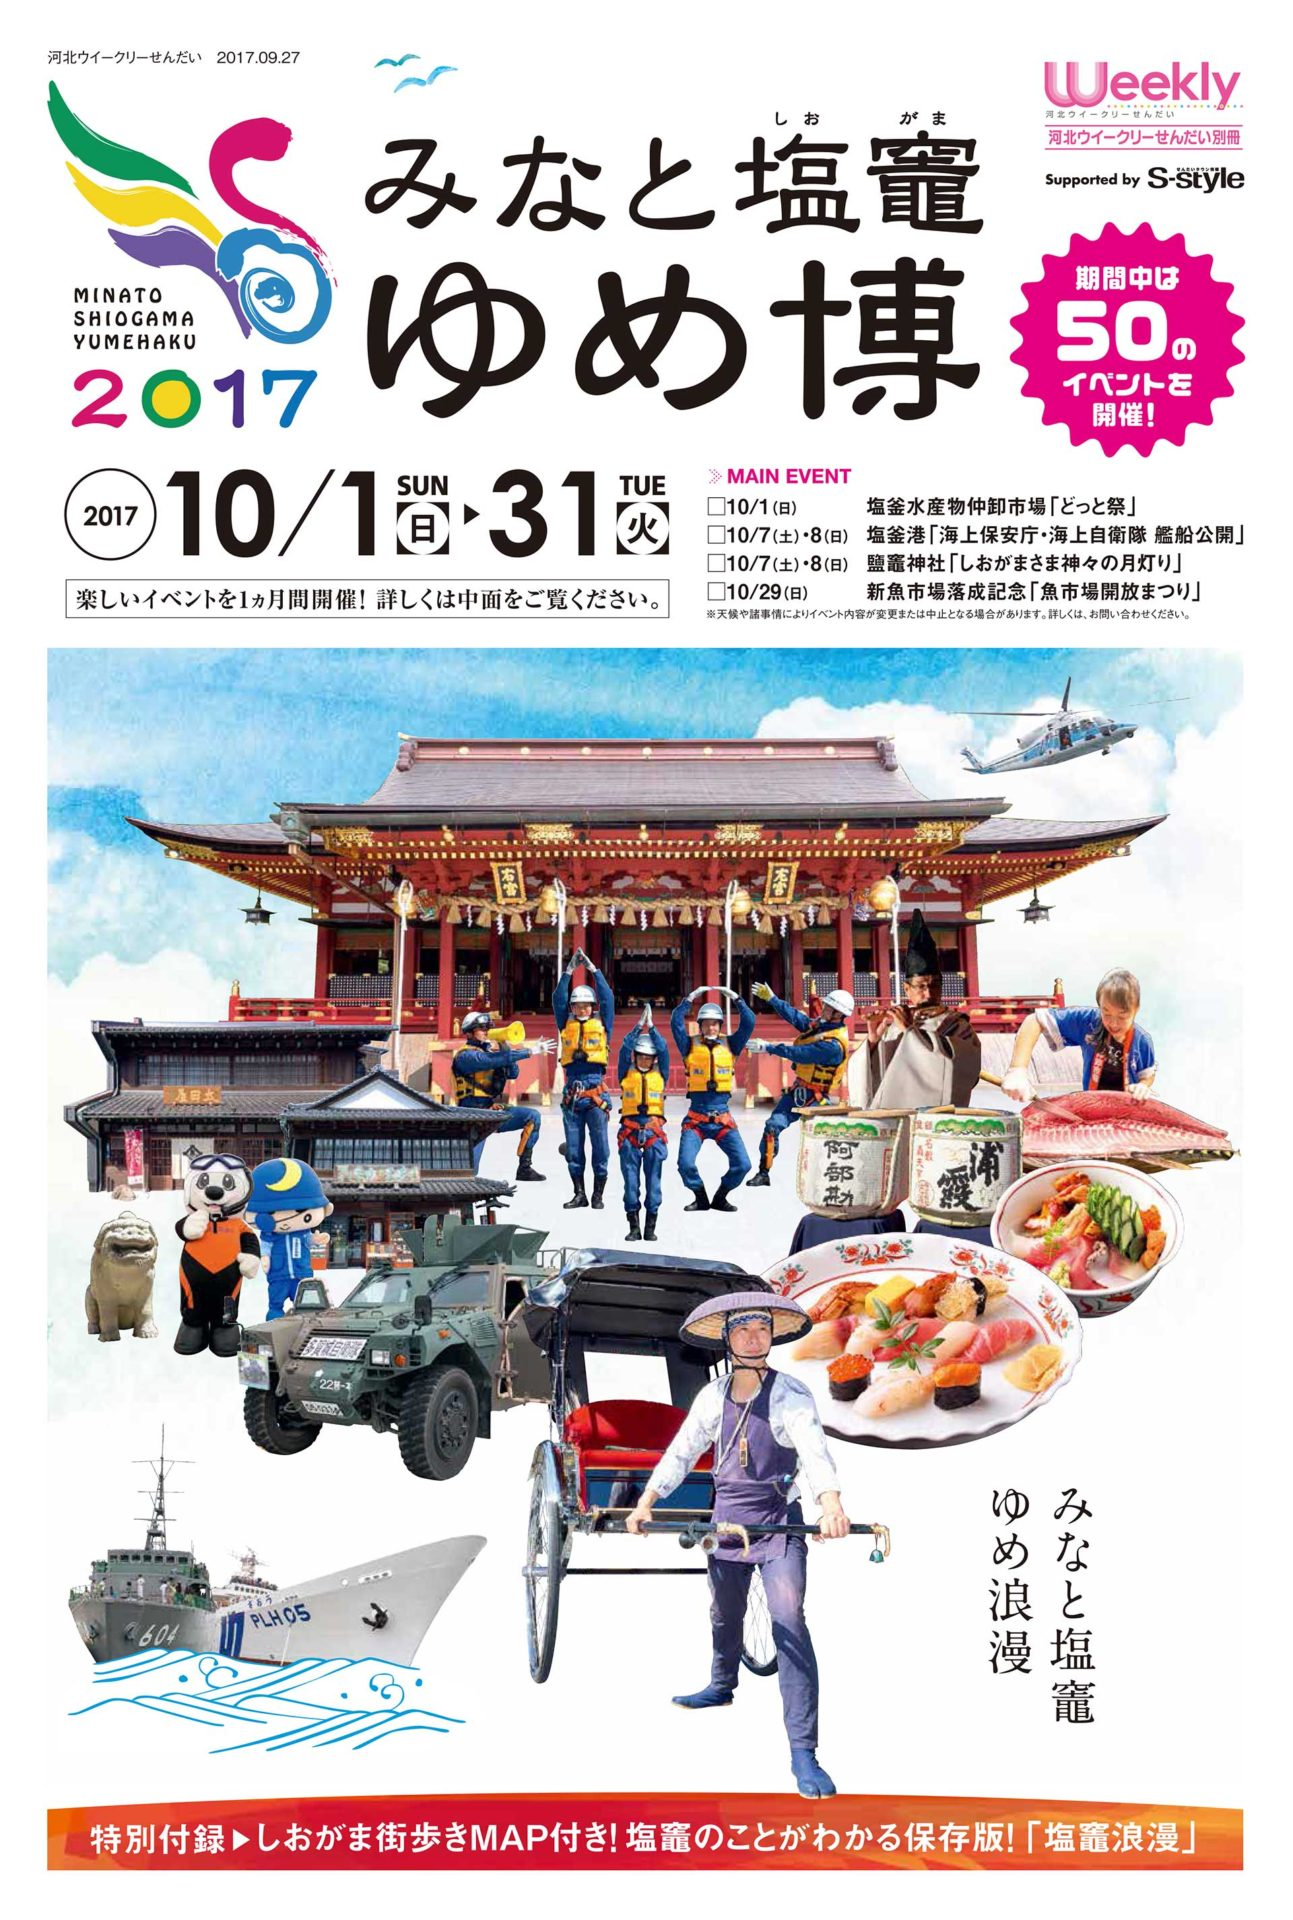 yumehaku_weekly01